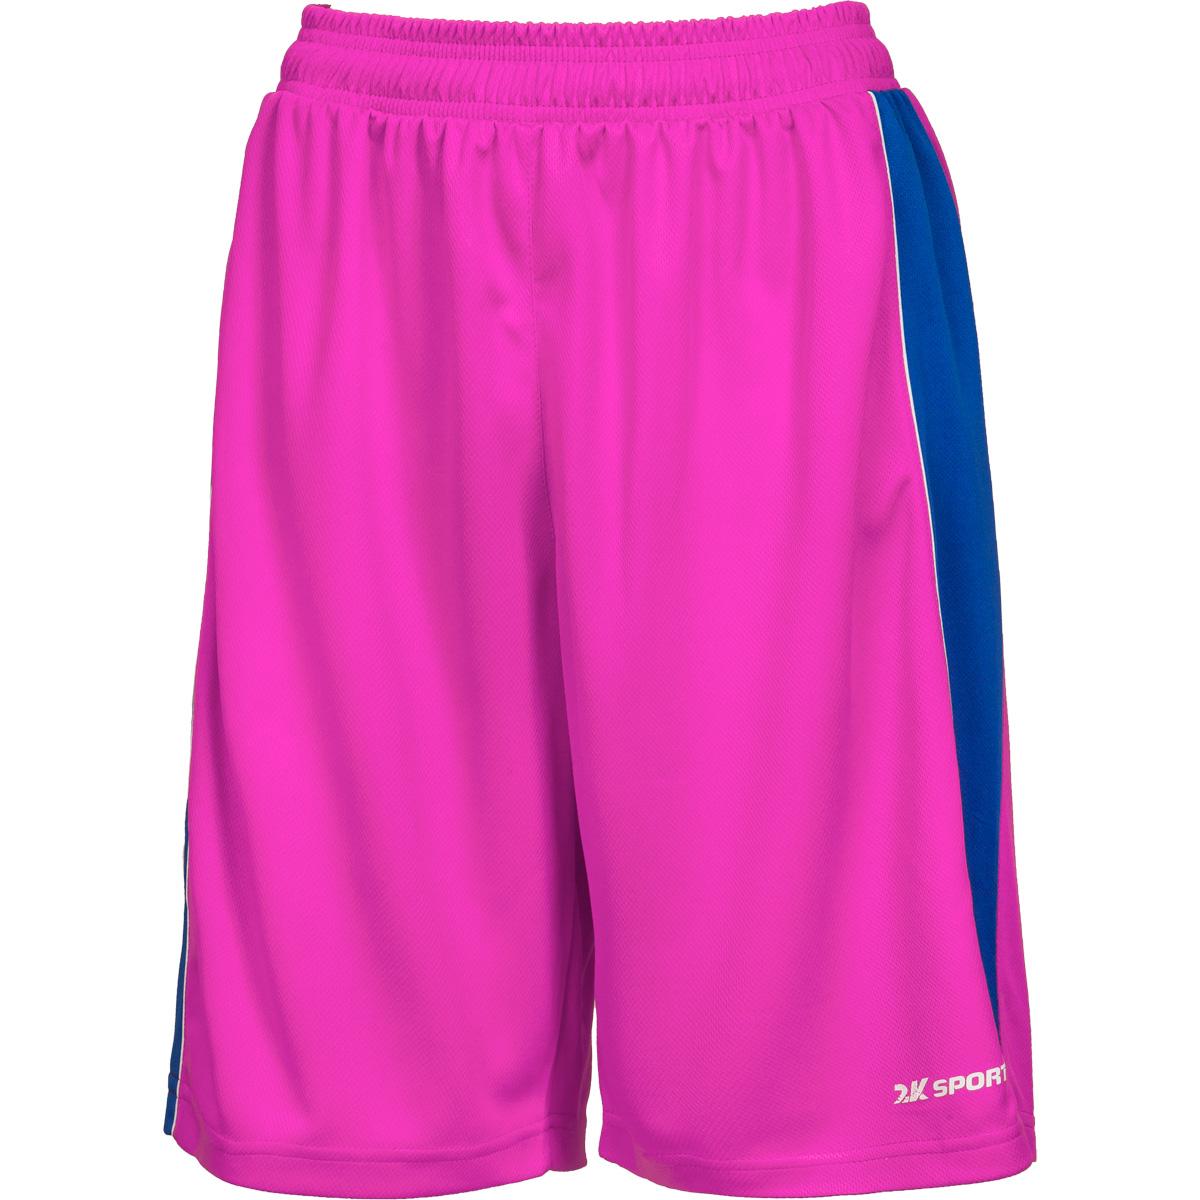 Шорты баскетбольные женские 2K Sport Advance, цвет: пурпурный, синий, белый. 130033. Размер S (42/44) - Баскетбол